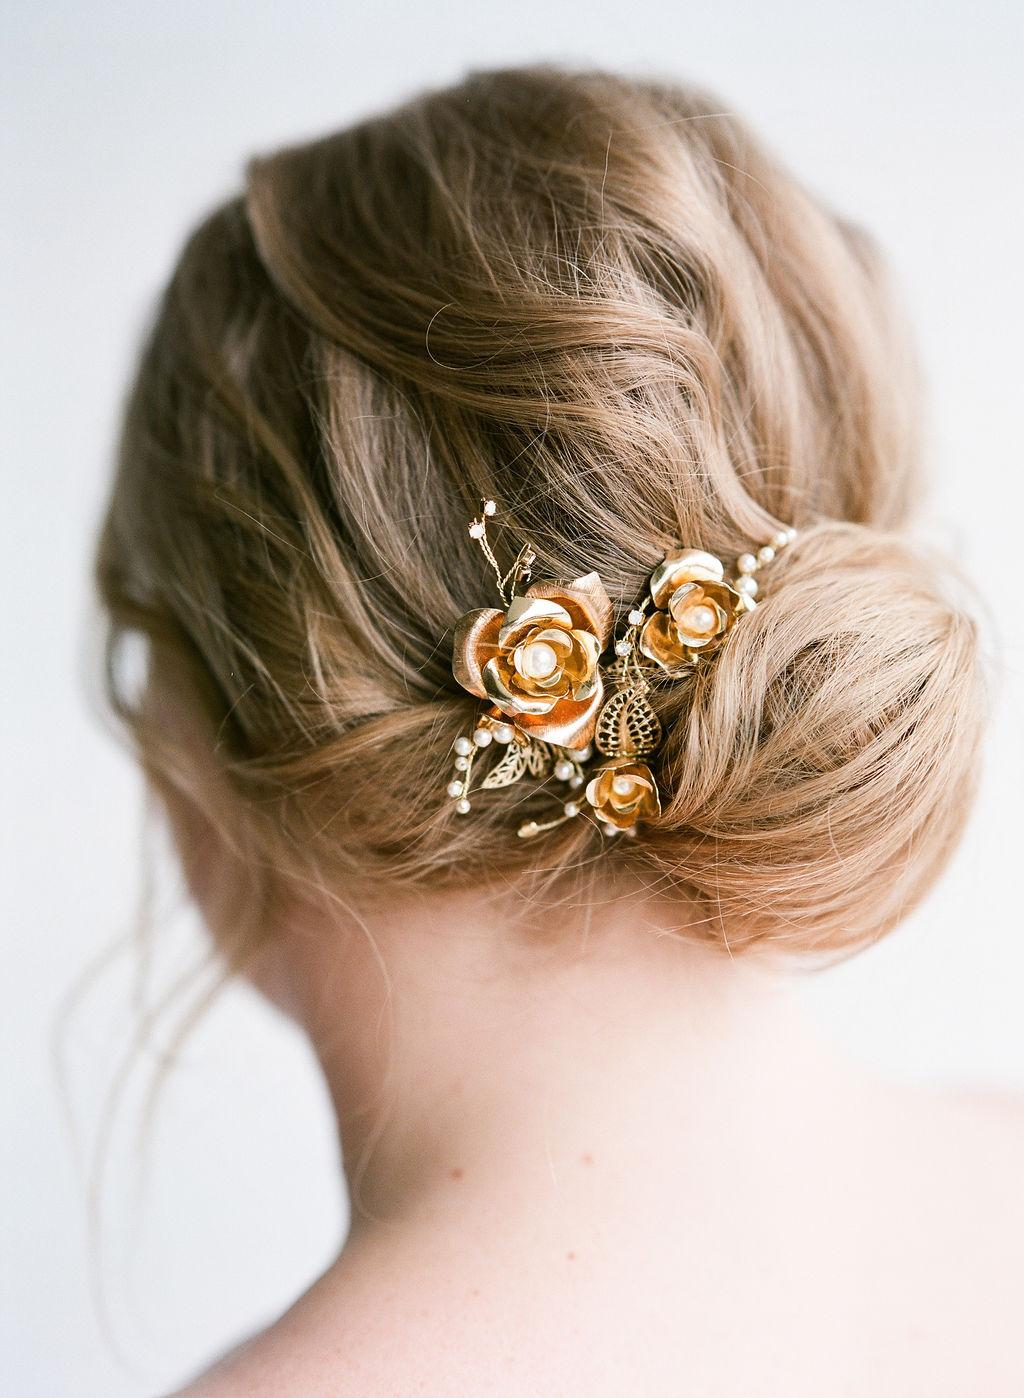 sarah_g_honest_ivory_sage_scarlet_wedding_bridal_dress_photography-16.JPG